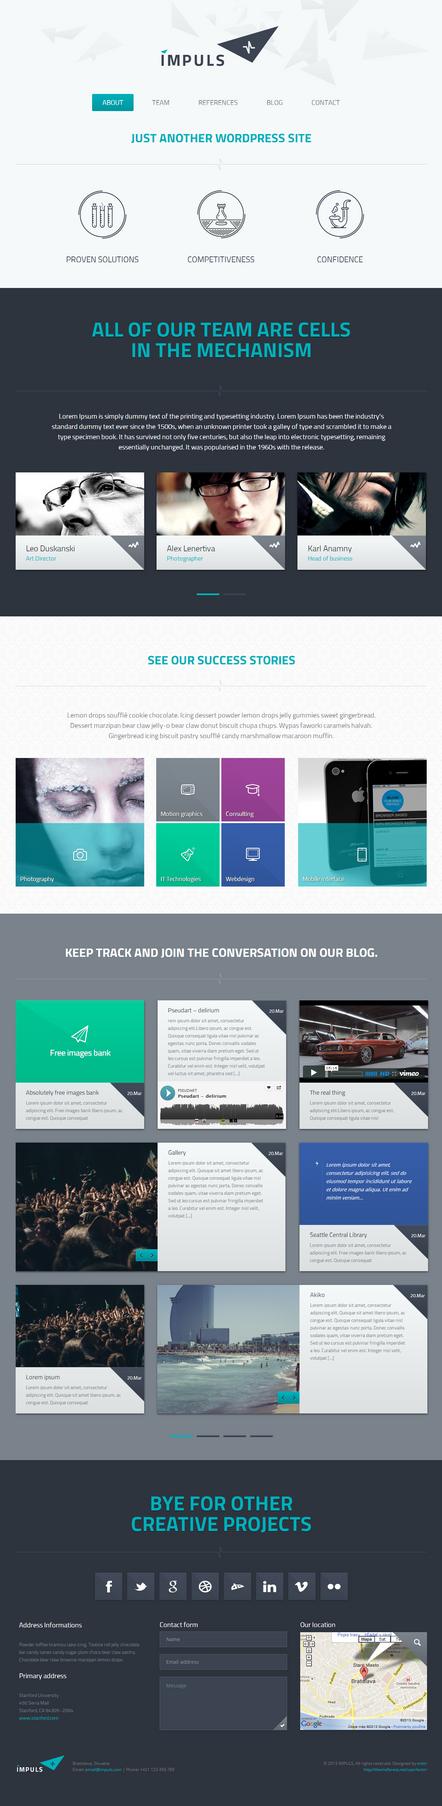 IMPULS a responsive WordPress Theme by the-webdesign